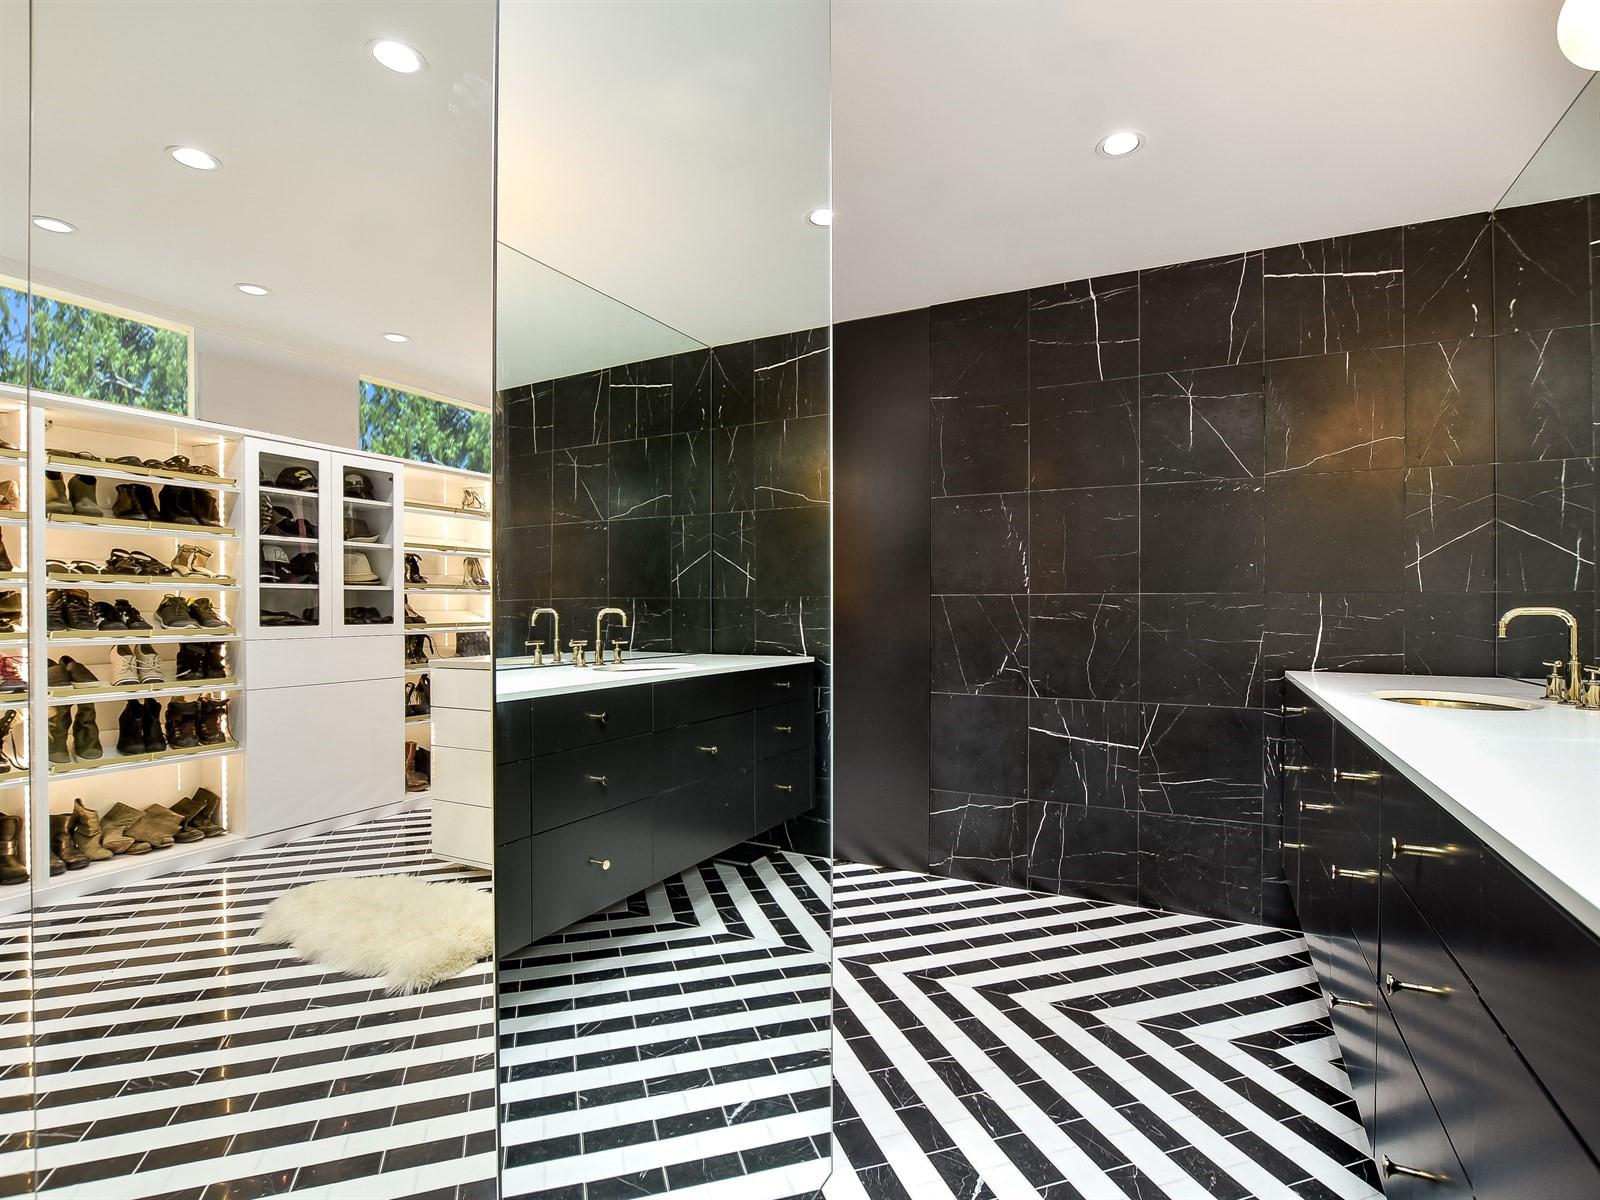 04 Binary Bathroom by Matt Fajkus Architecture.jpg